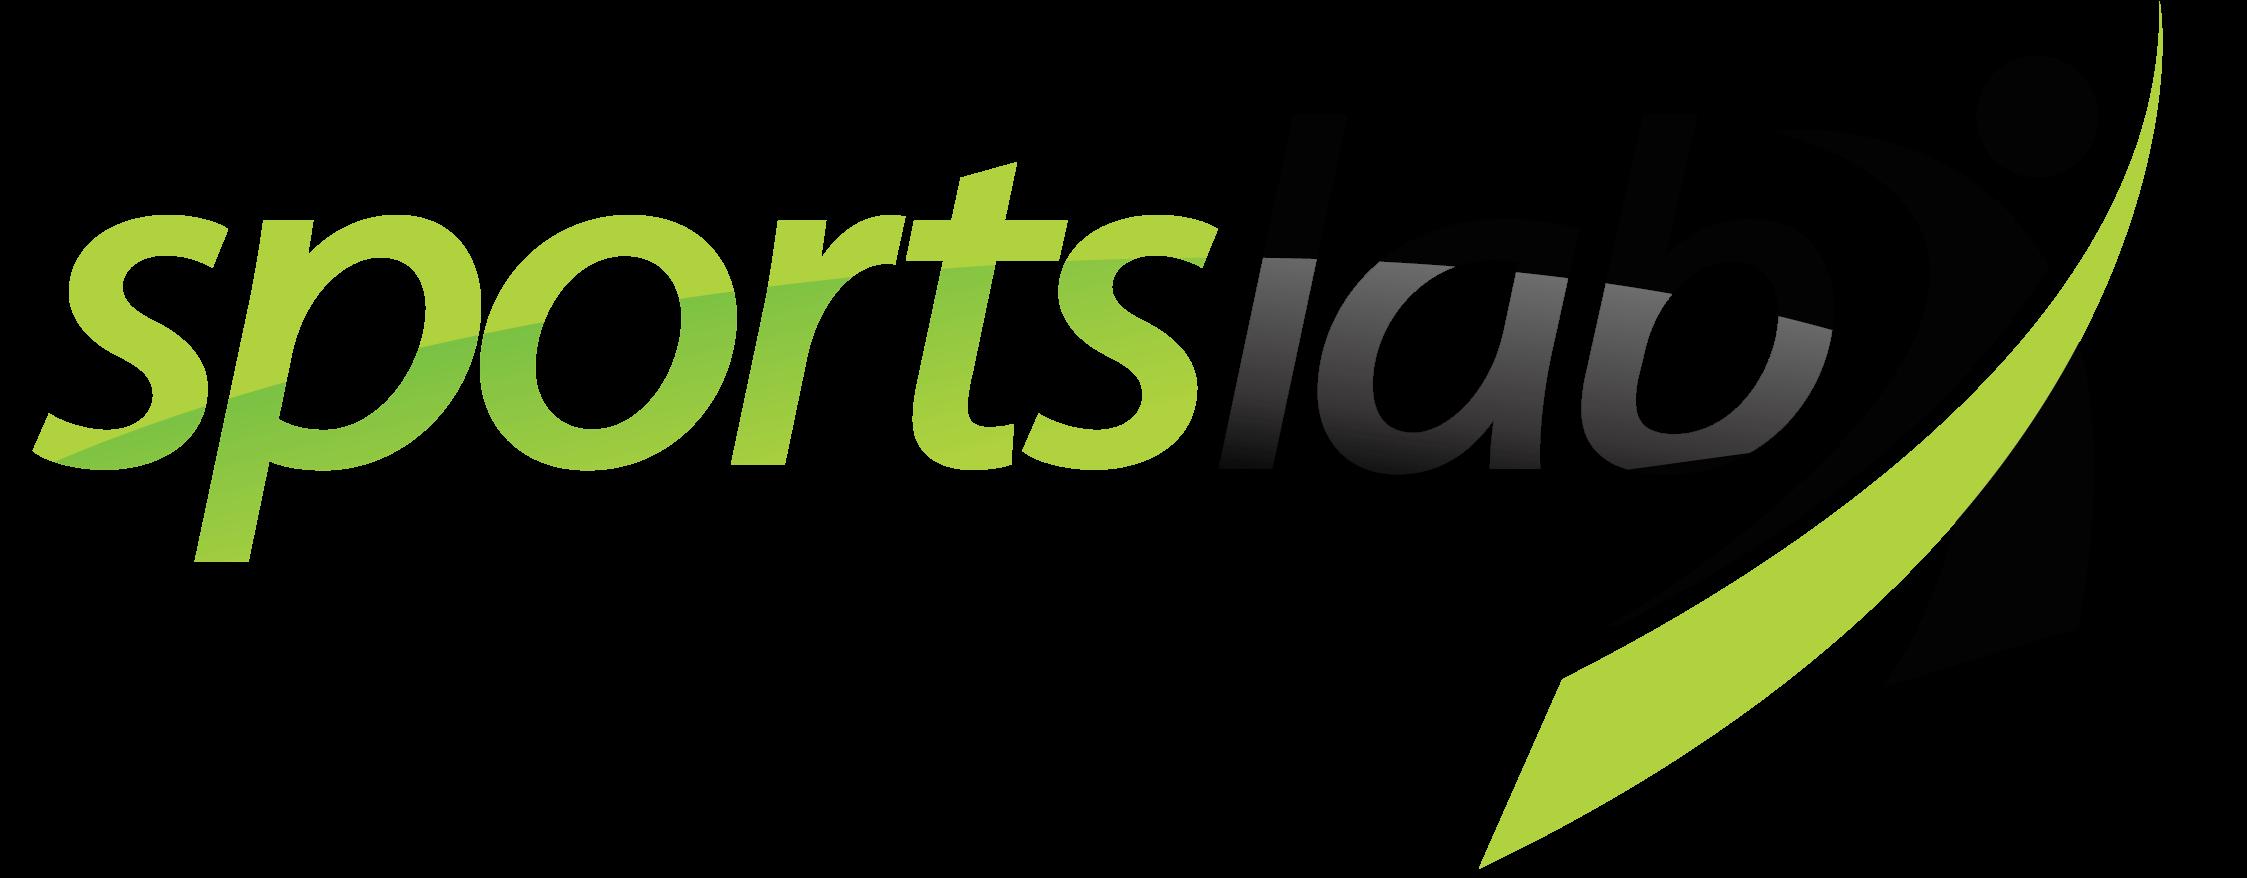 Sports-Lab-CMYK-no-tagline-01-1.png